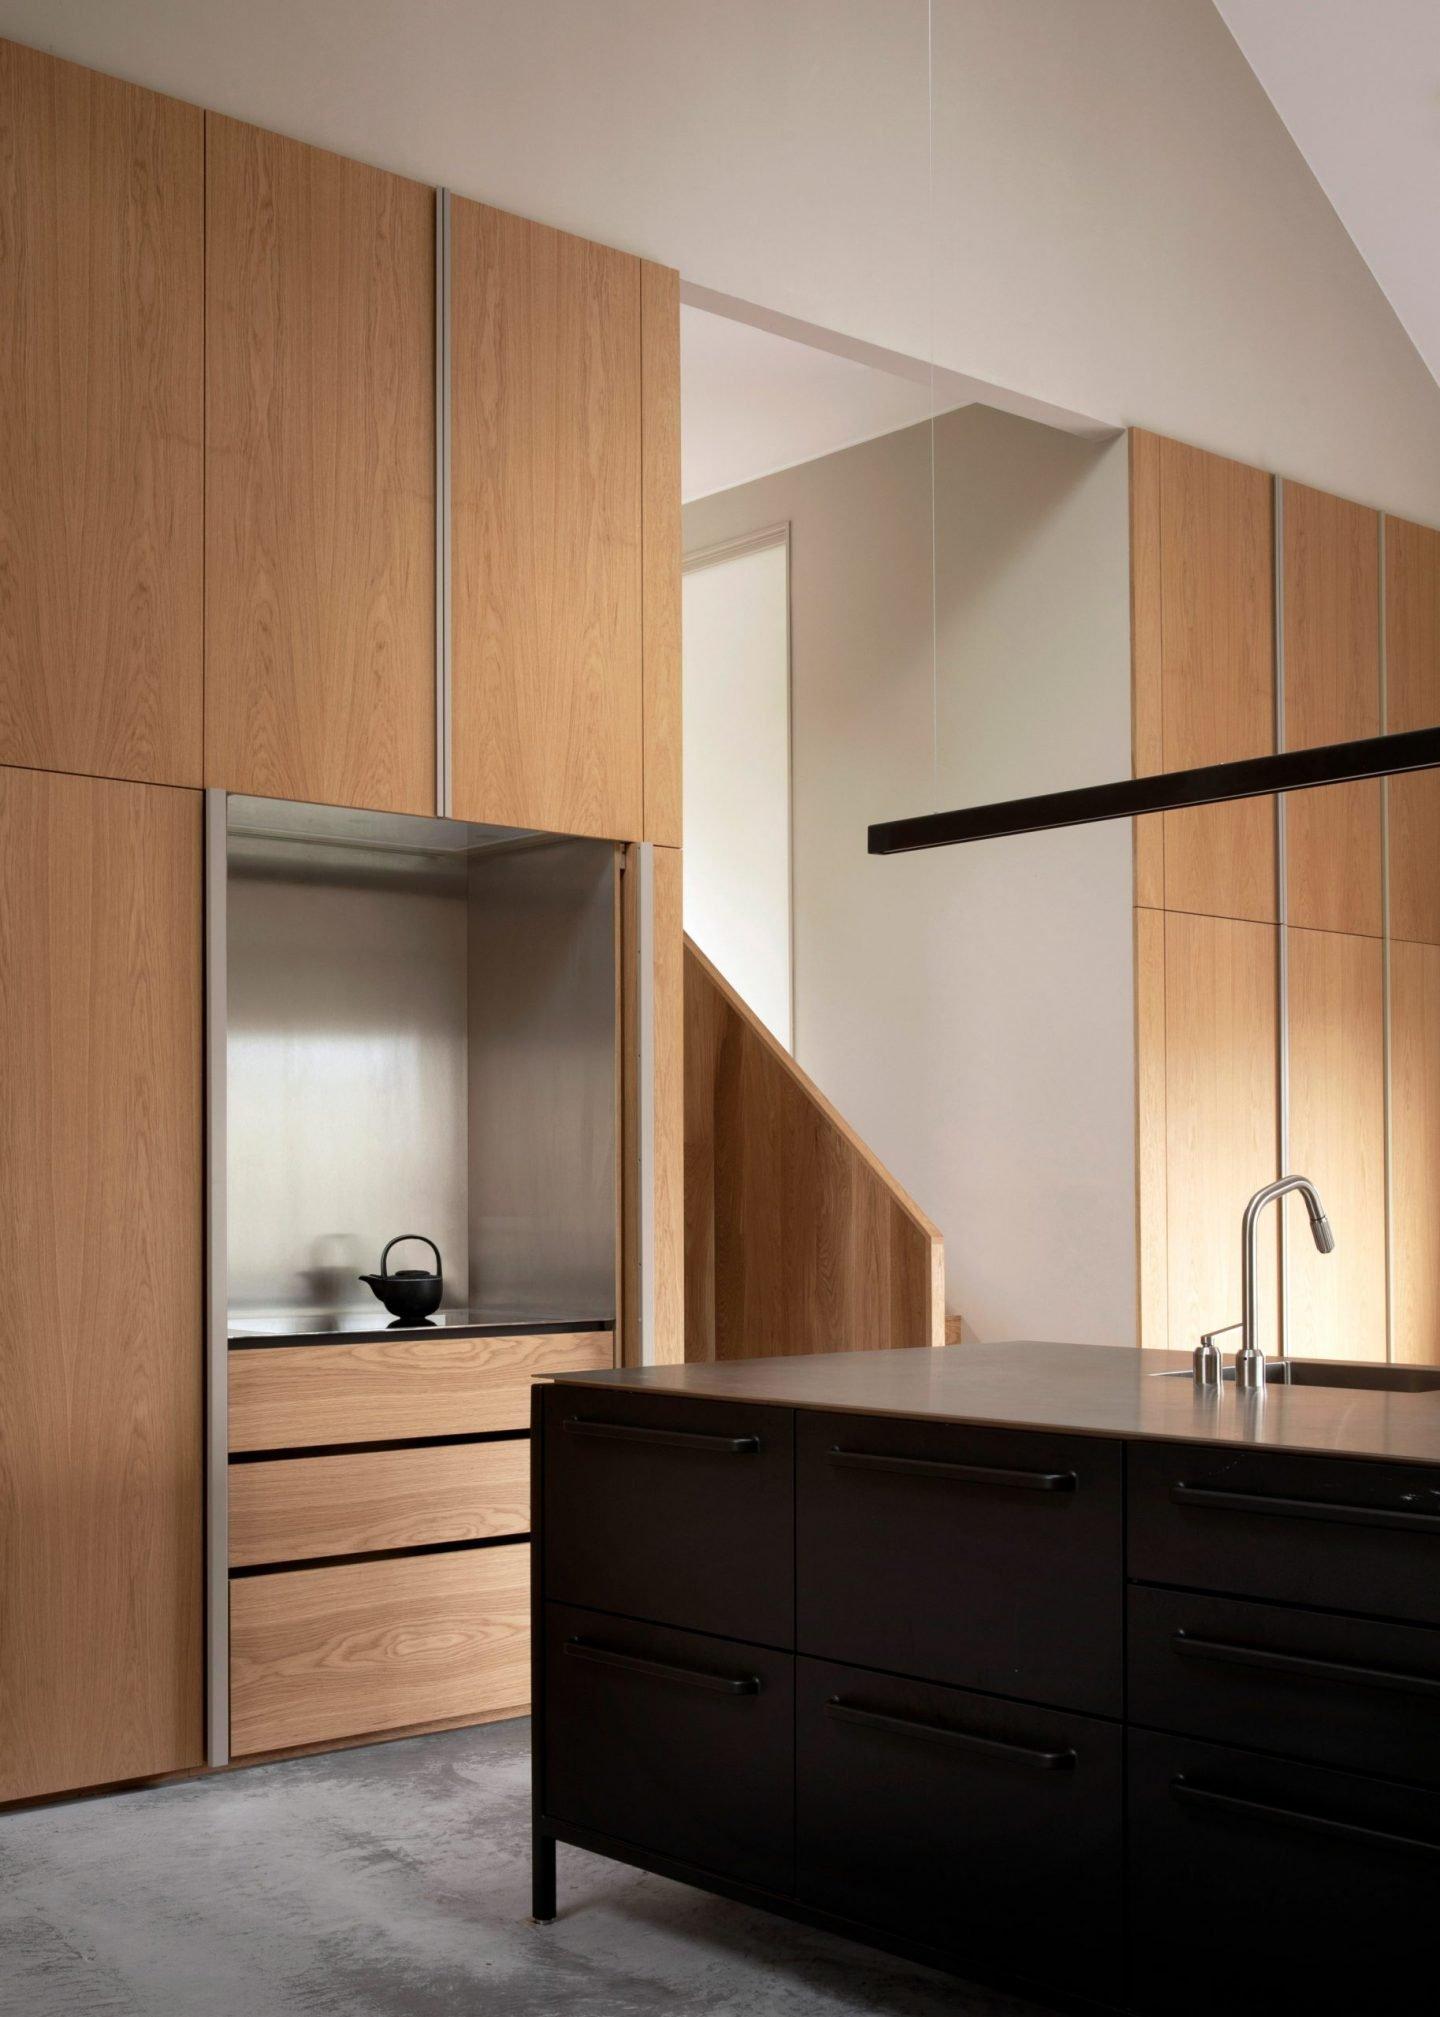 IGNANT-Architecture-Norm-Architects-Archipelago-House-020